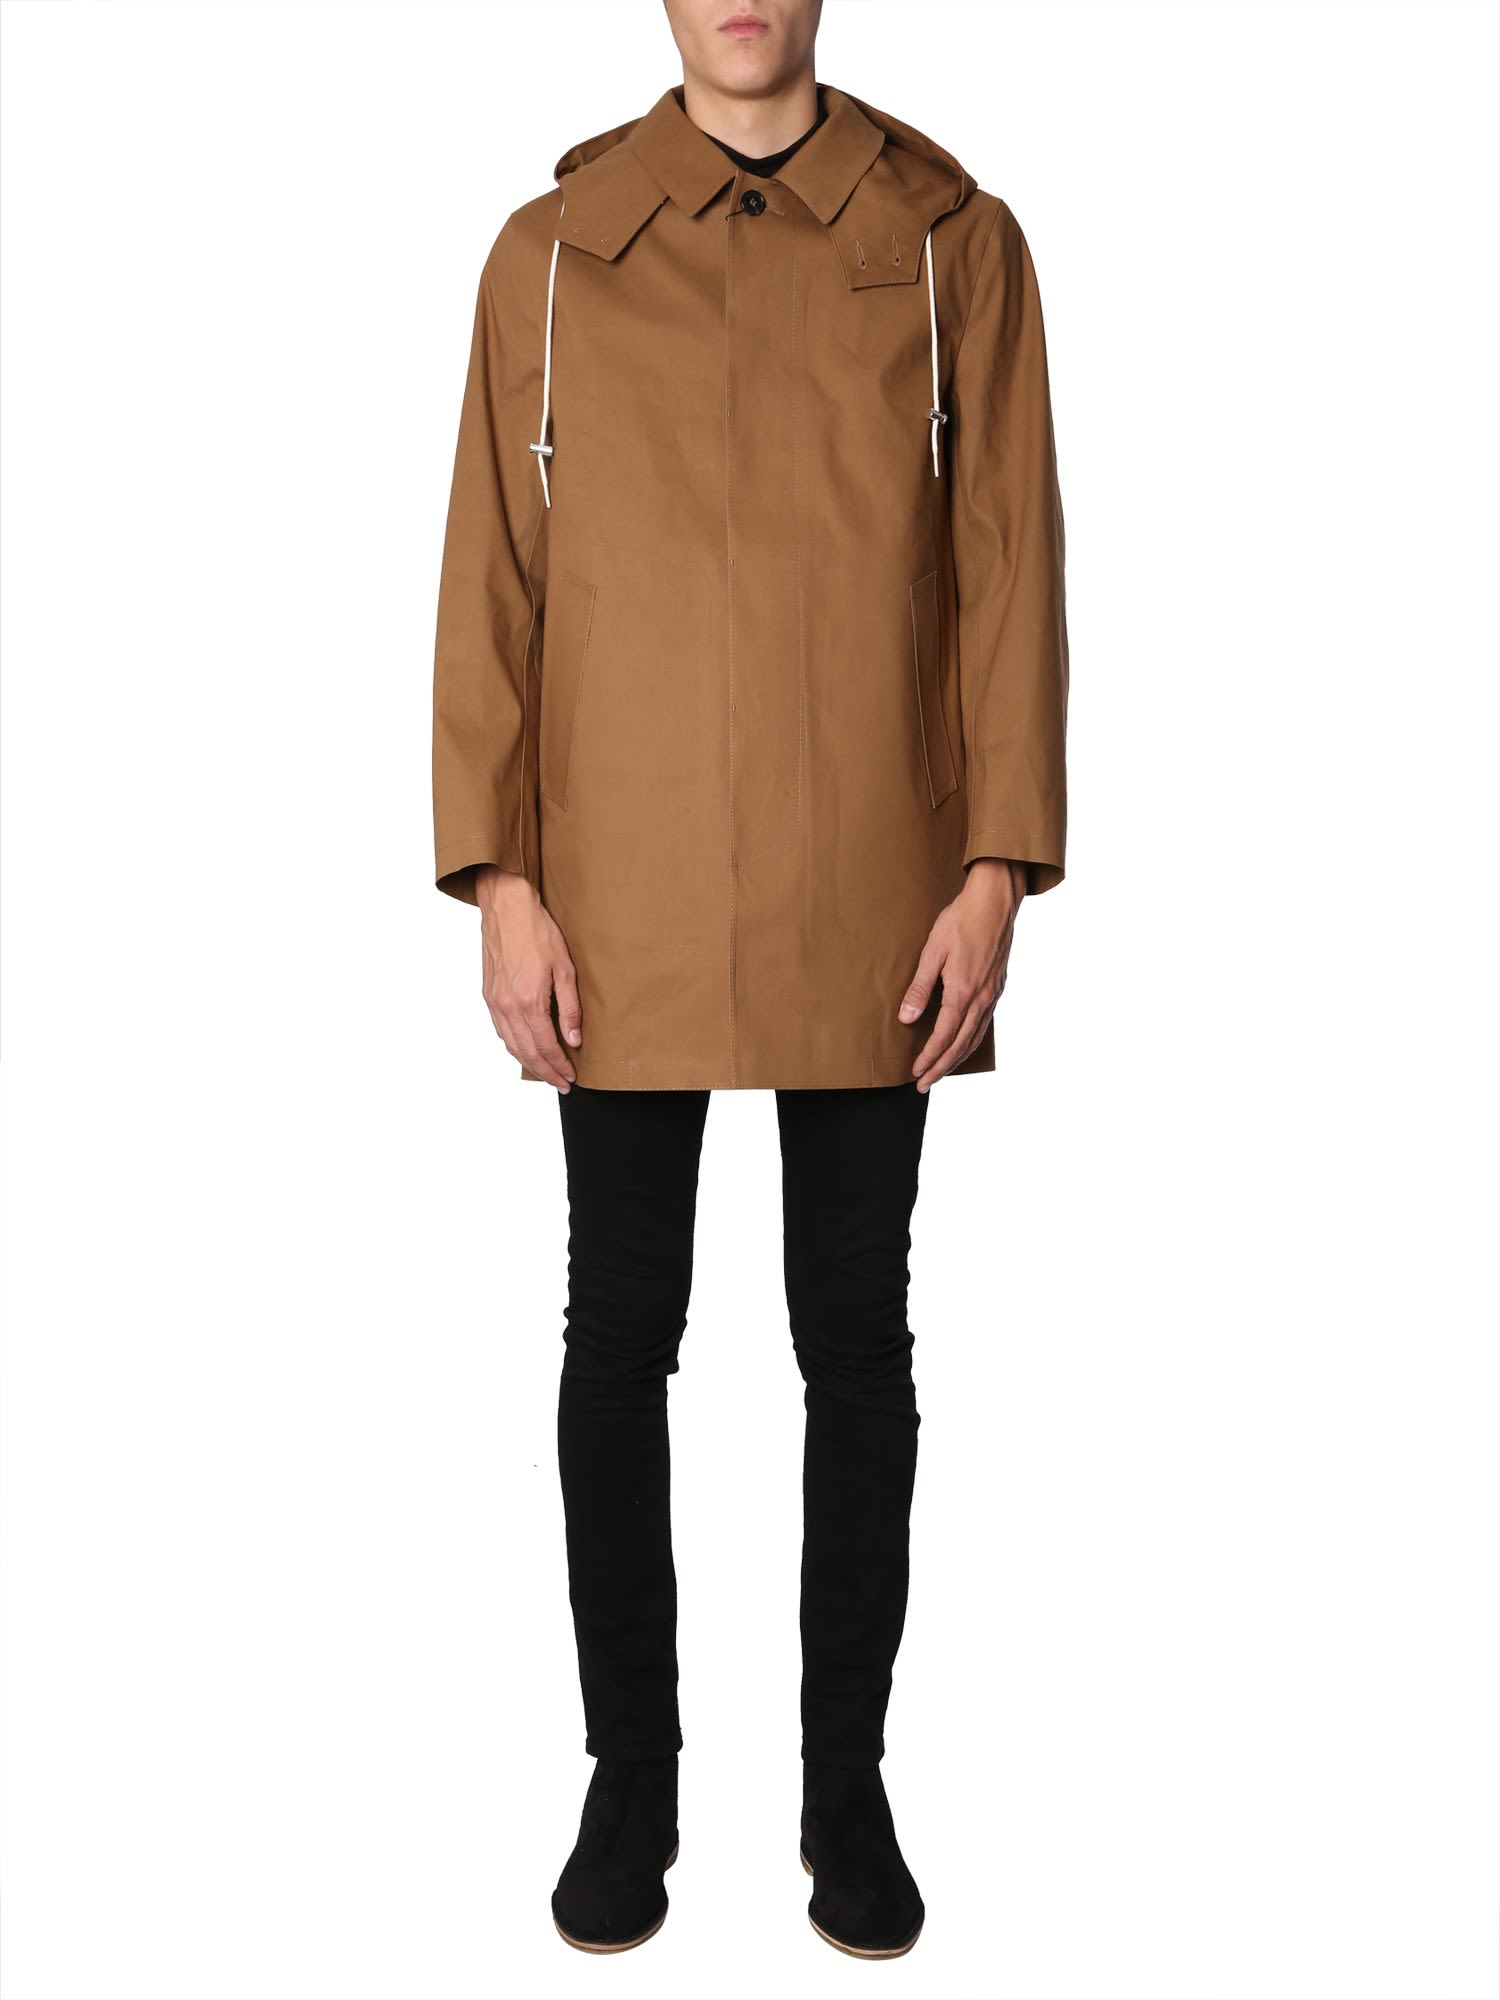 pre order classic style of 2019 yet not vulgar Mackintosh Mackintosh Hooded Coat - MARRONE - 10797995 | italist